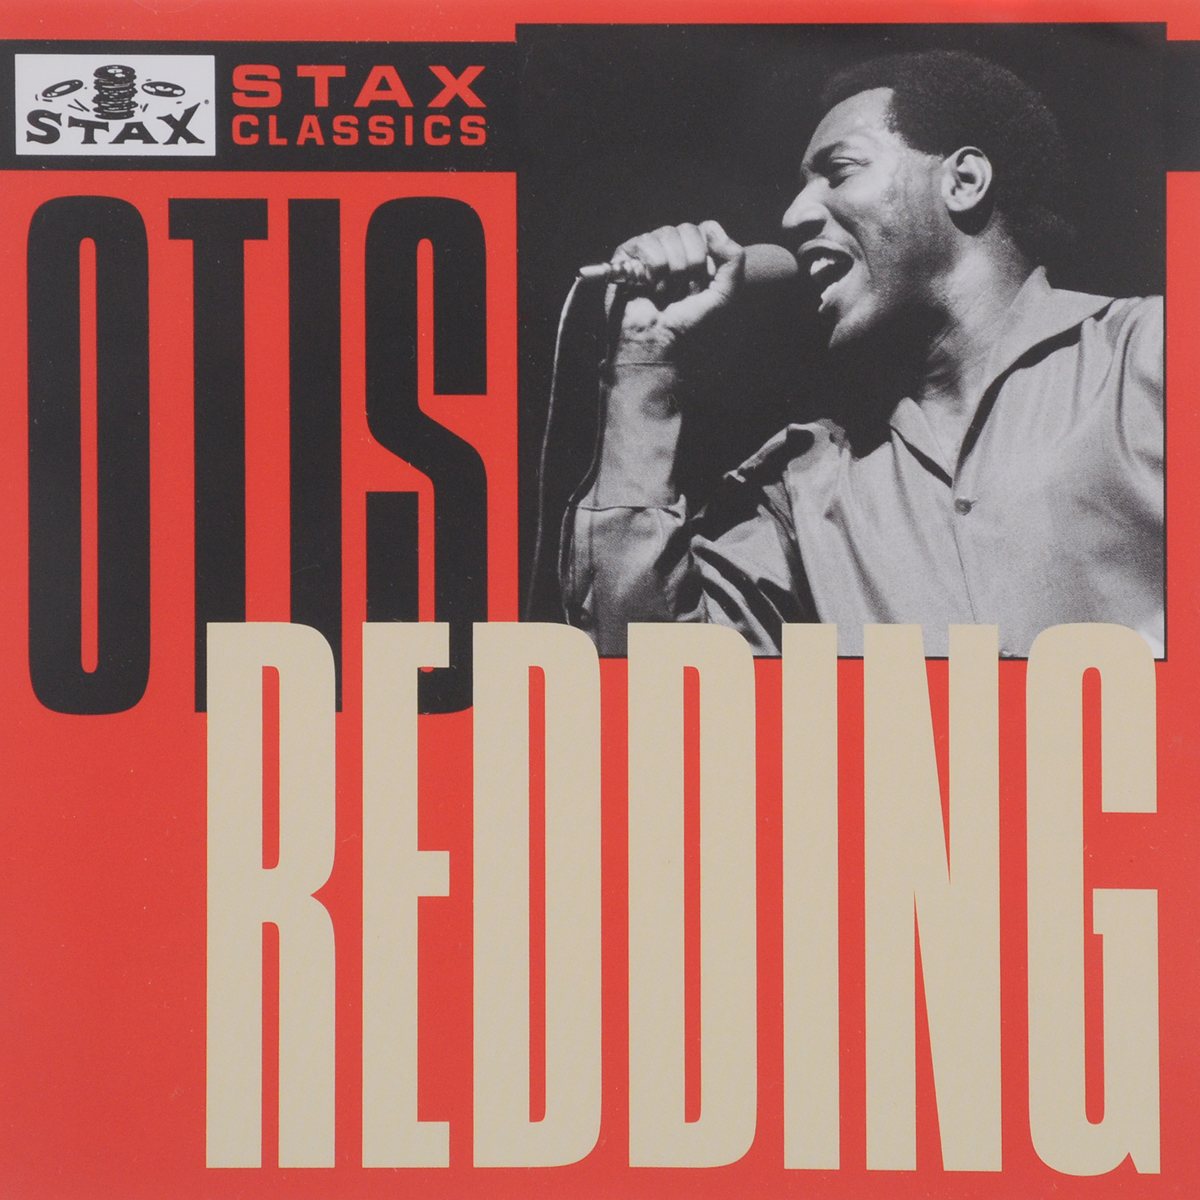 Отис Реддинг Otis Redding. Stax Classics цена 2017